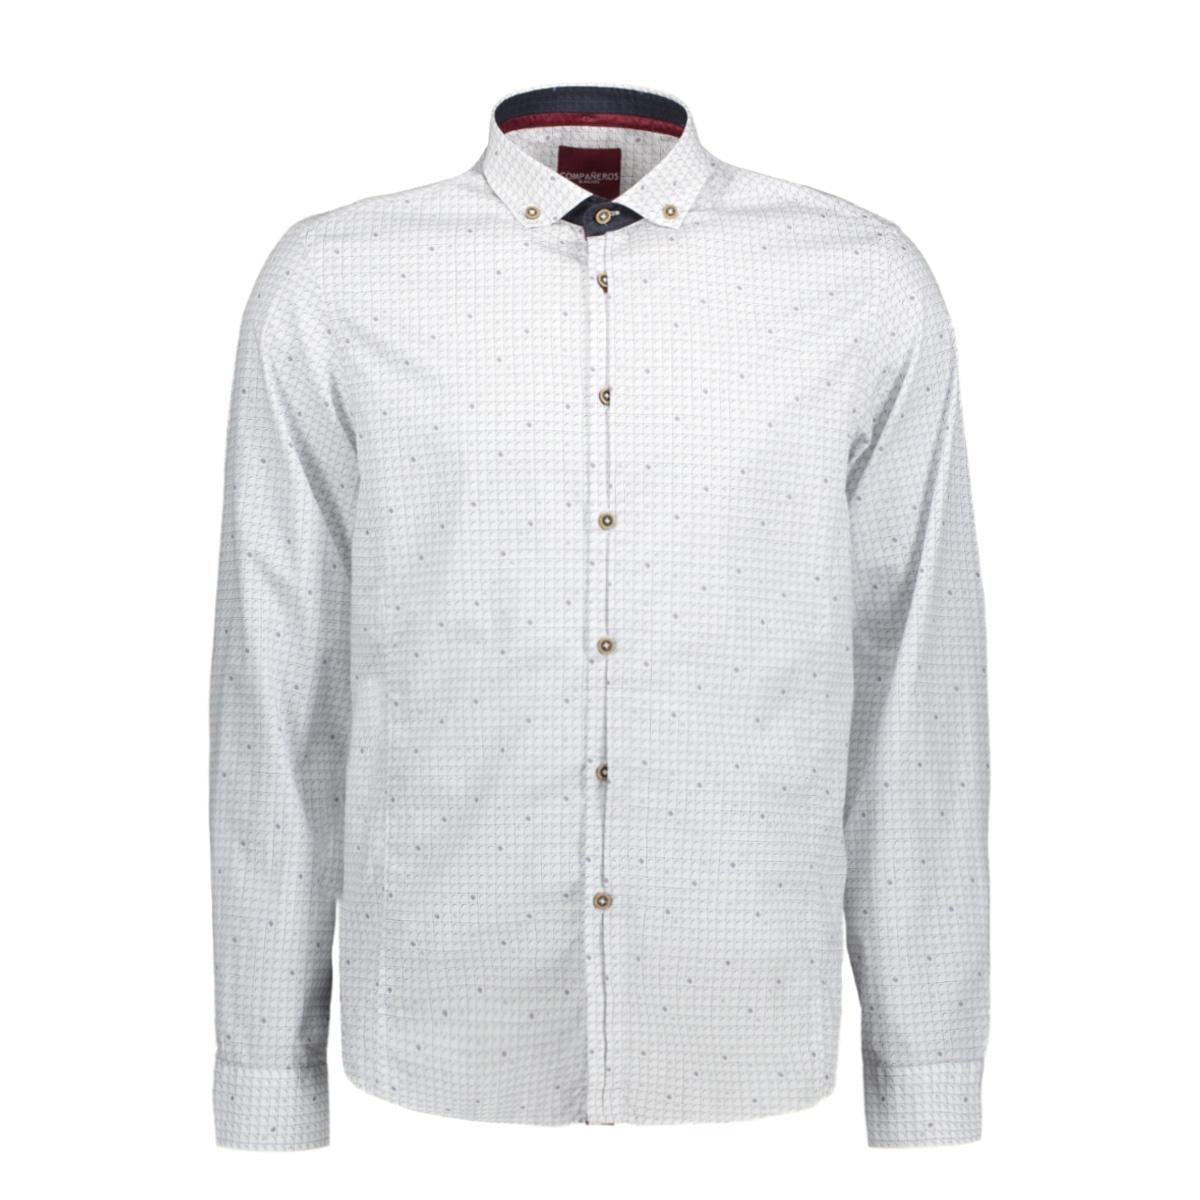 aw17srt006 companeros overhemd white 10